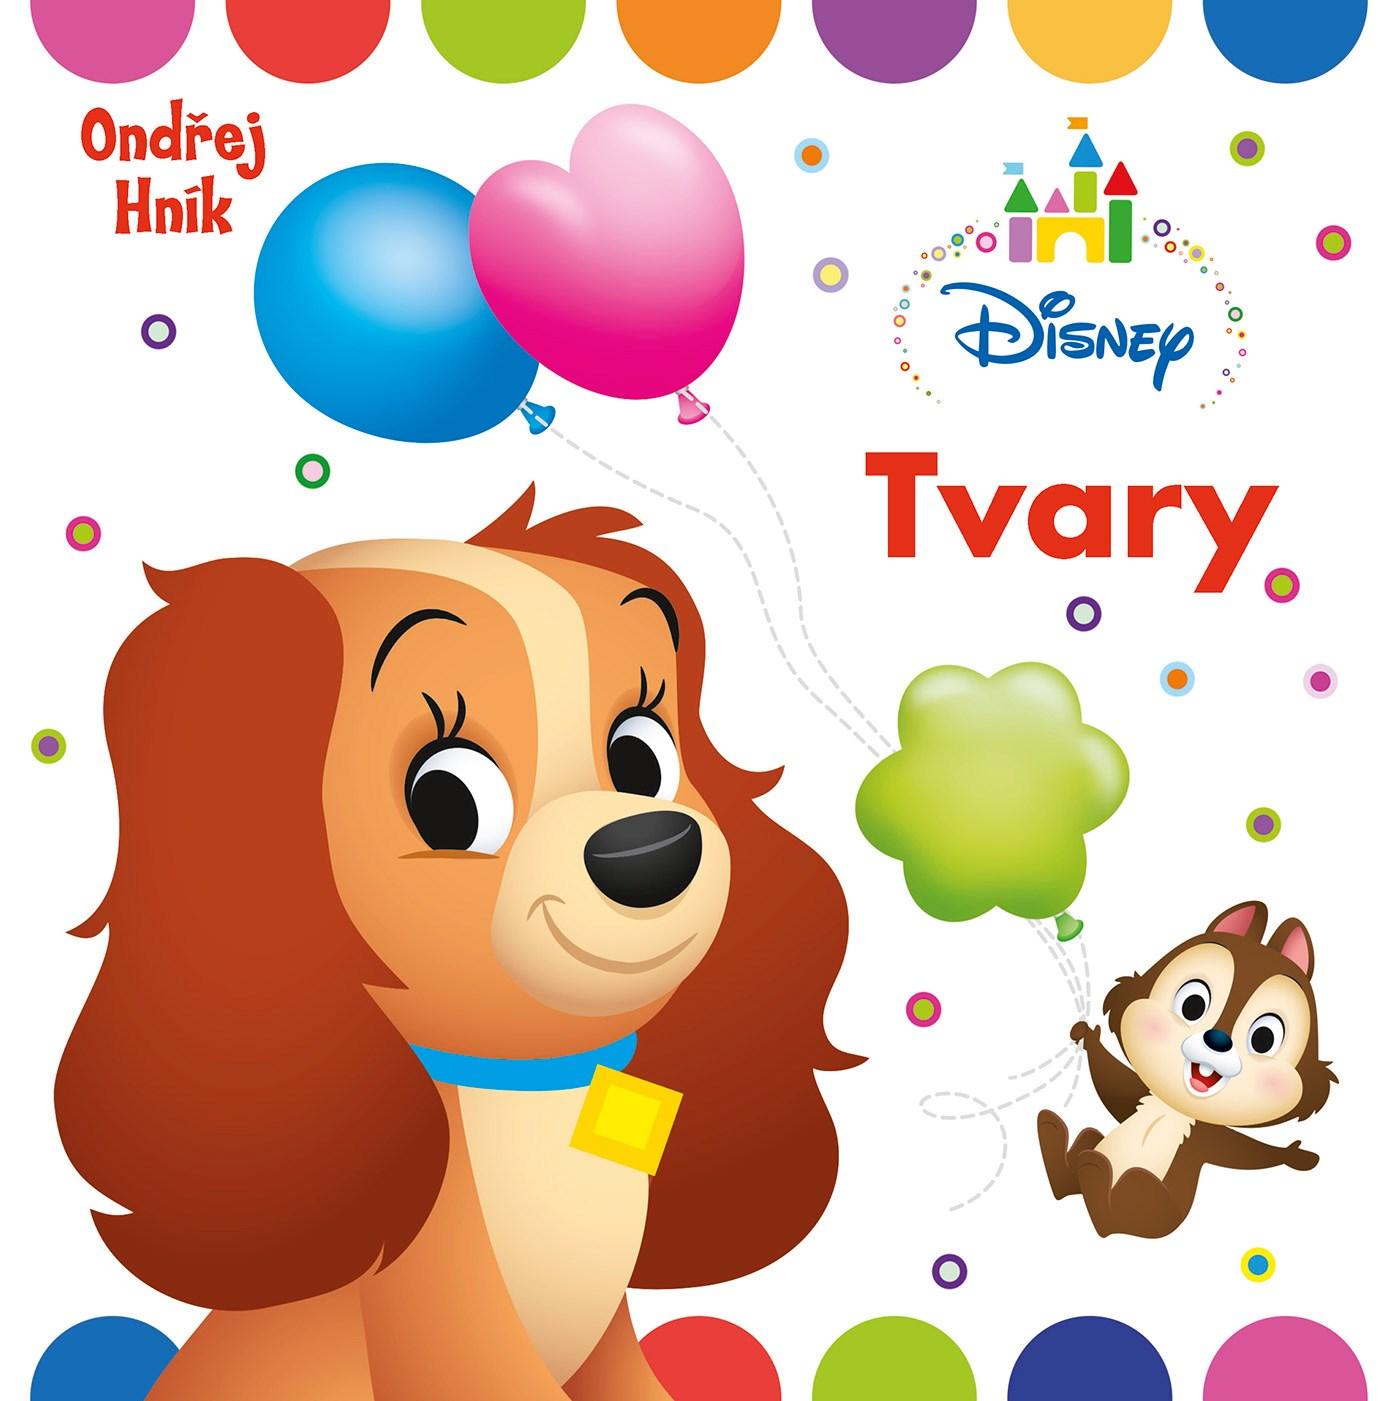 Disney - Tvary